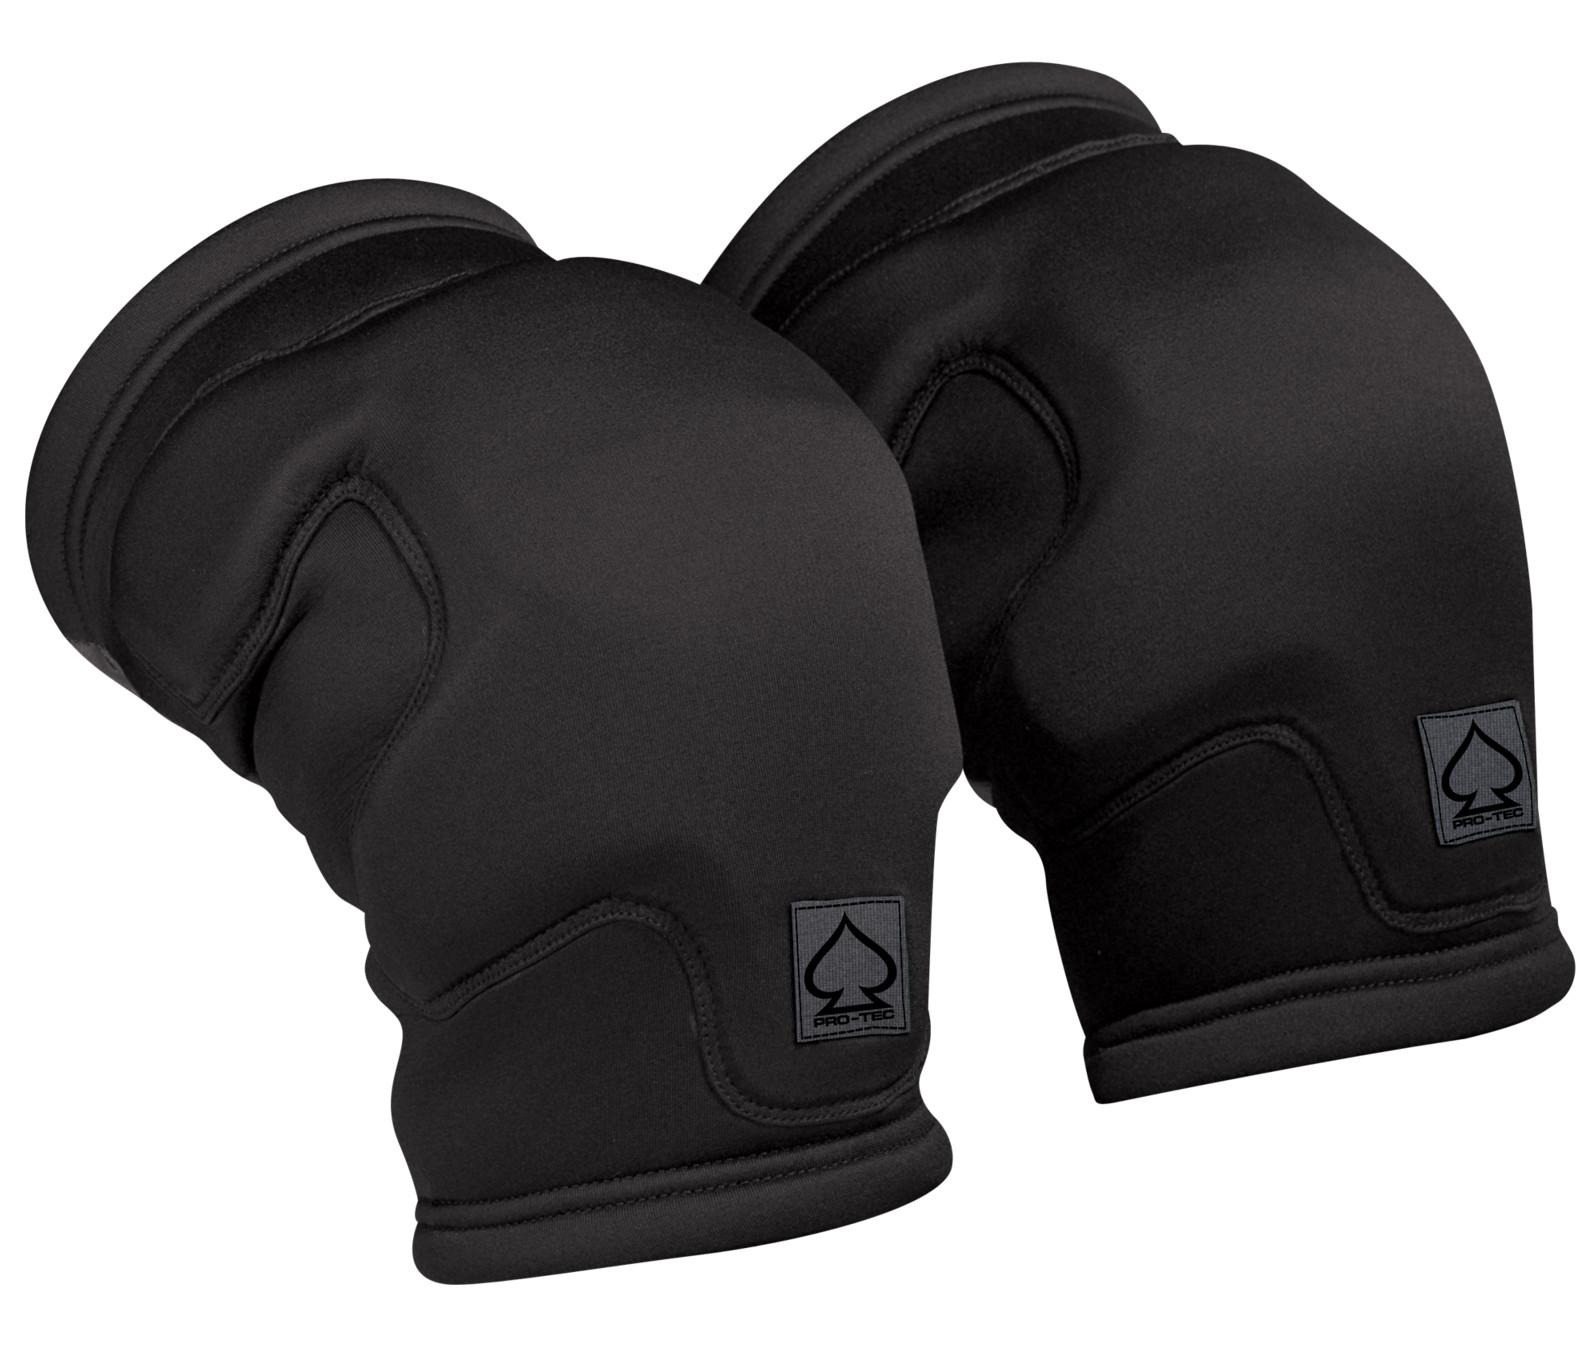 Pro-Tec IPS Knee Pads  Pro-Tec IPS Knee Pads